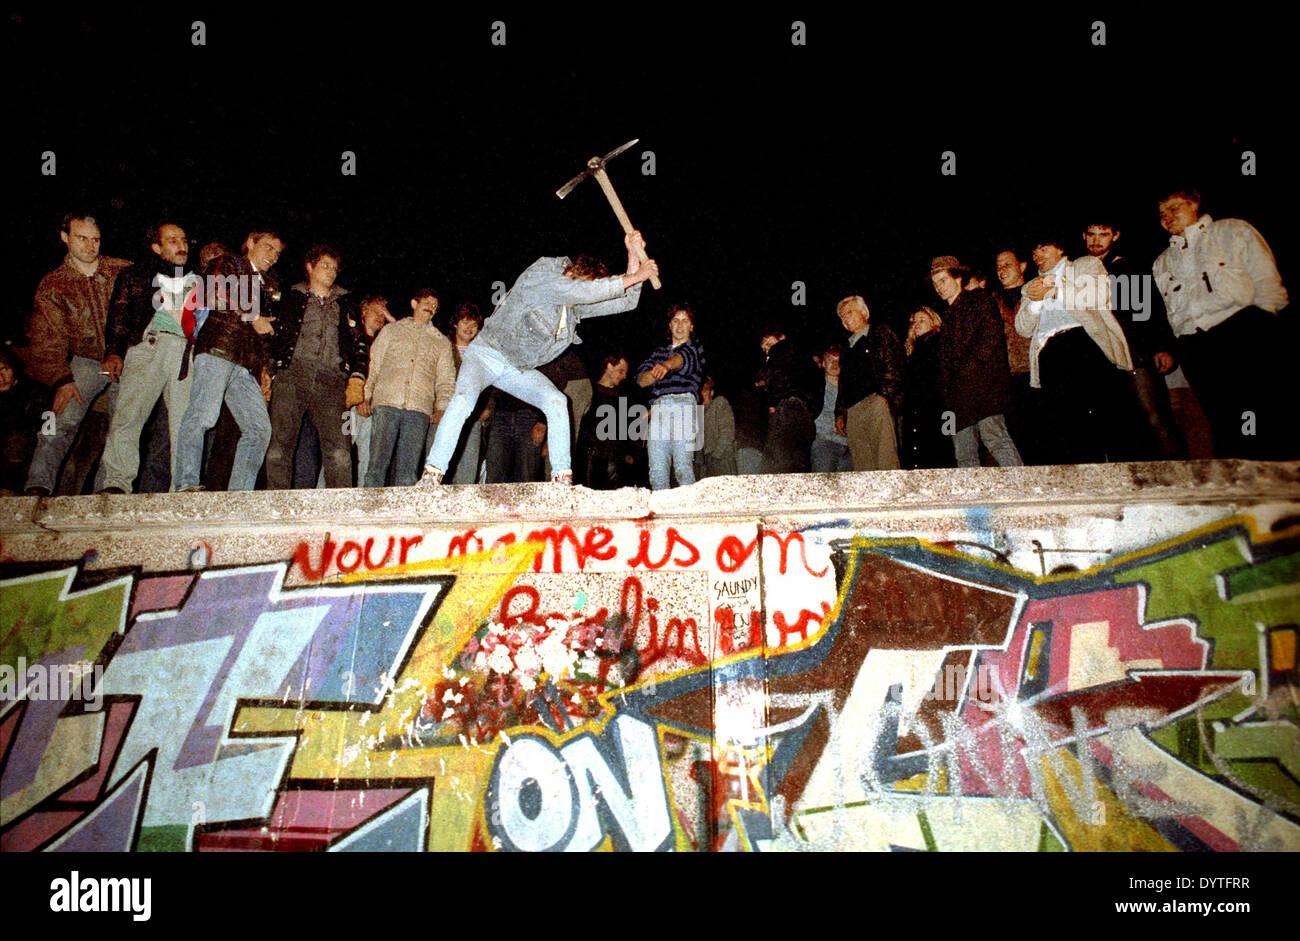 Fall der Berliner Mauer, 1989 Stockbild